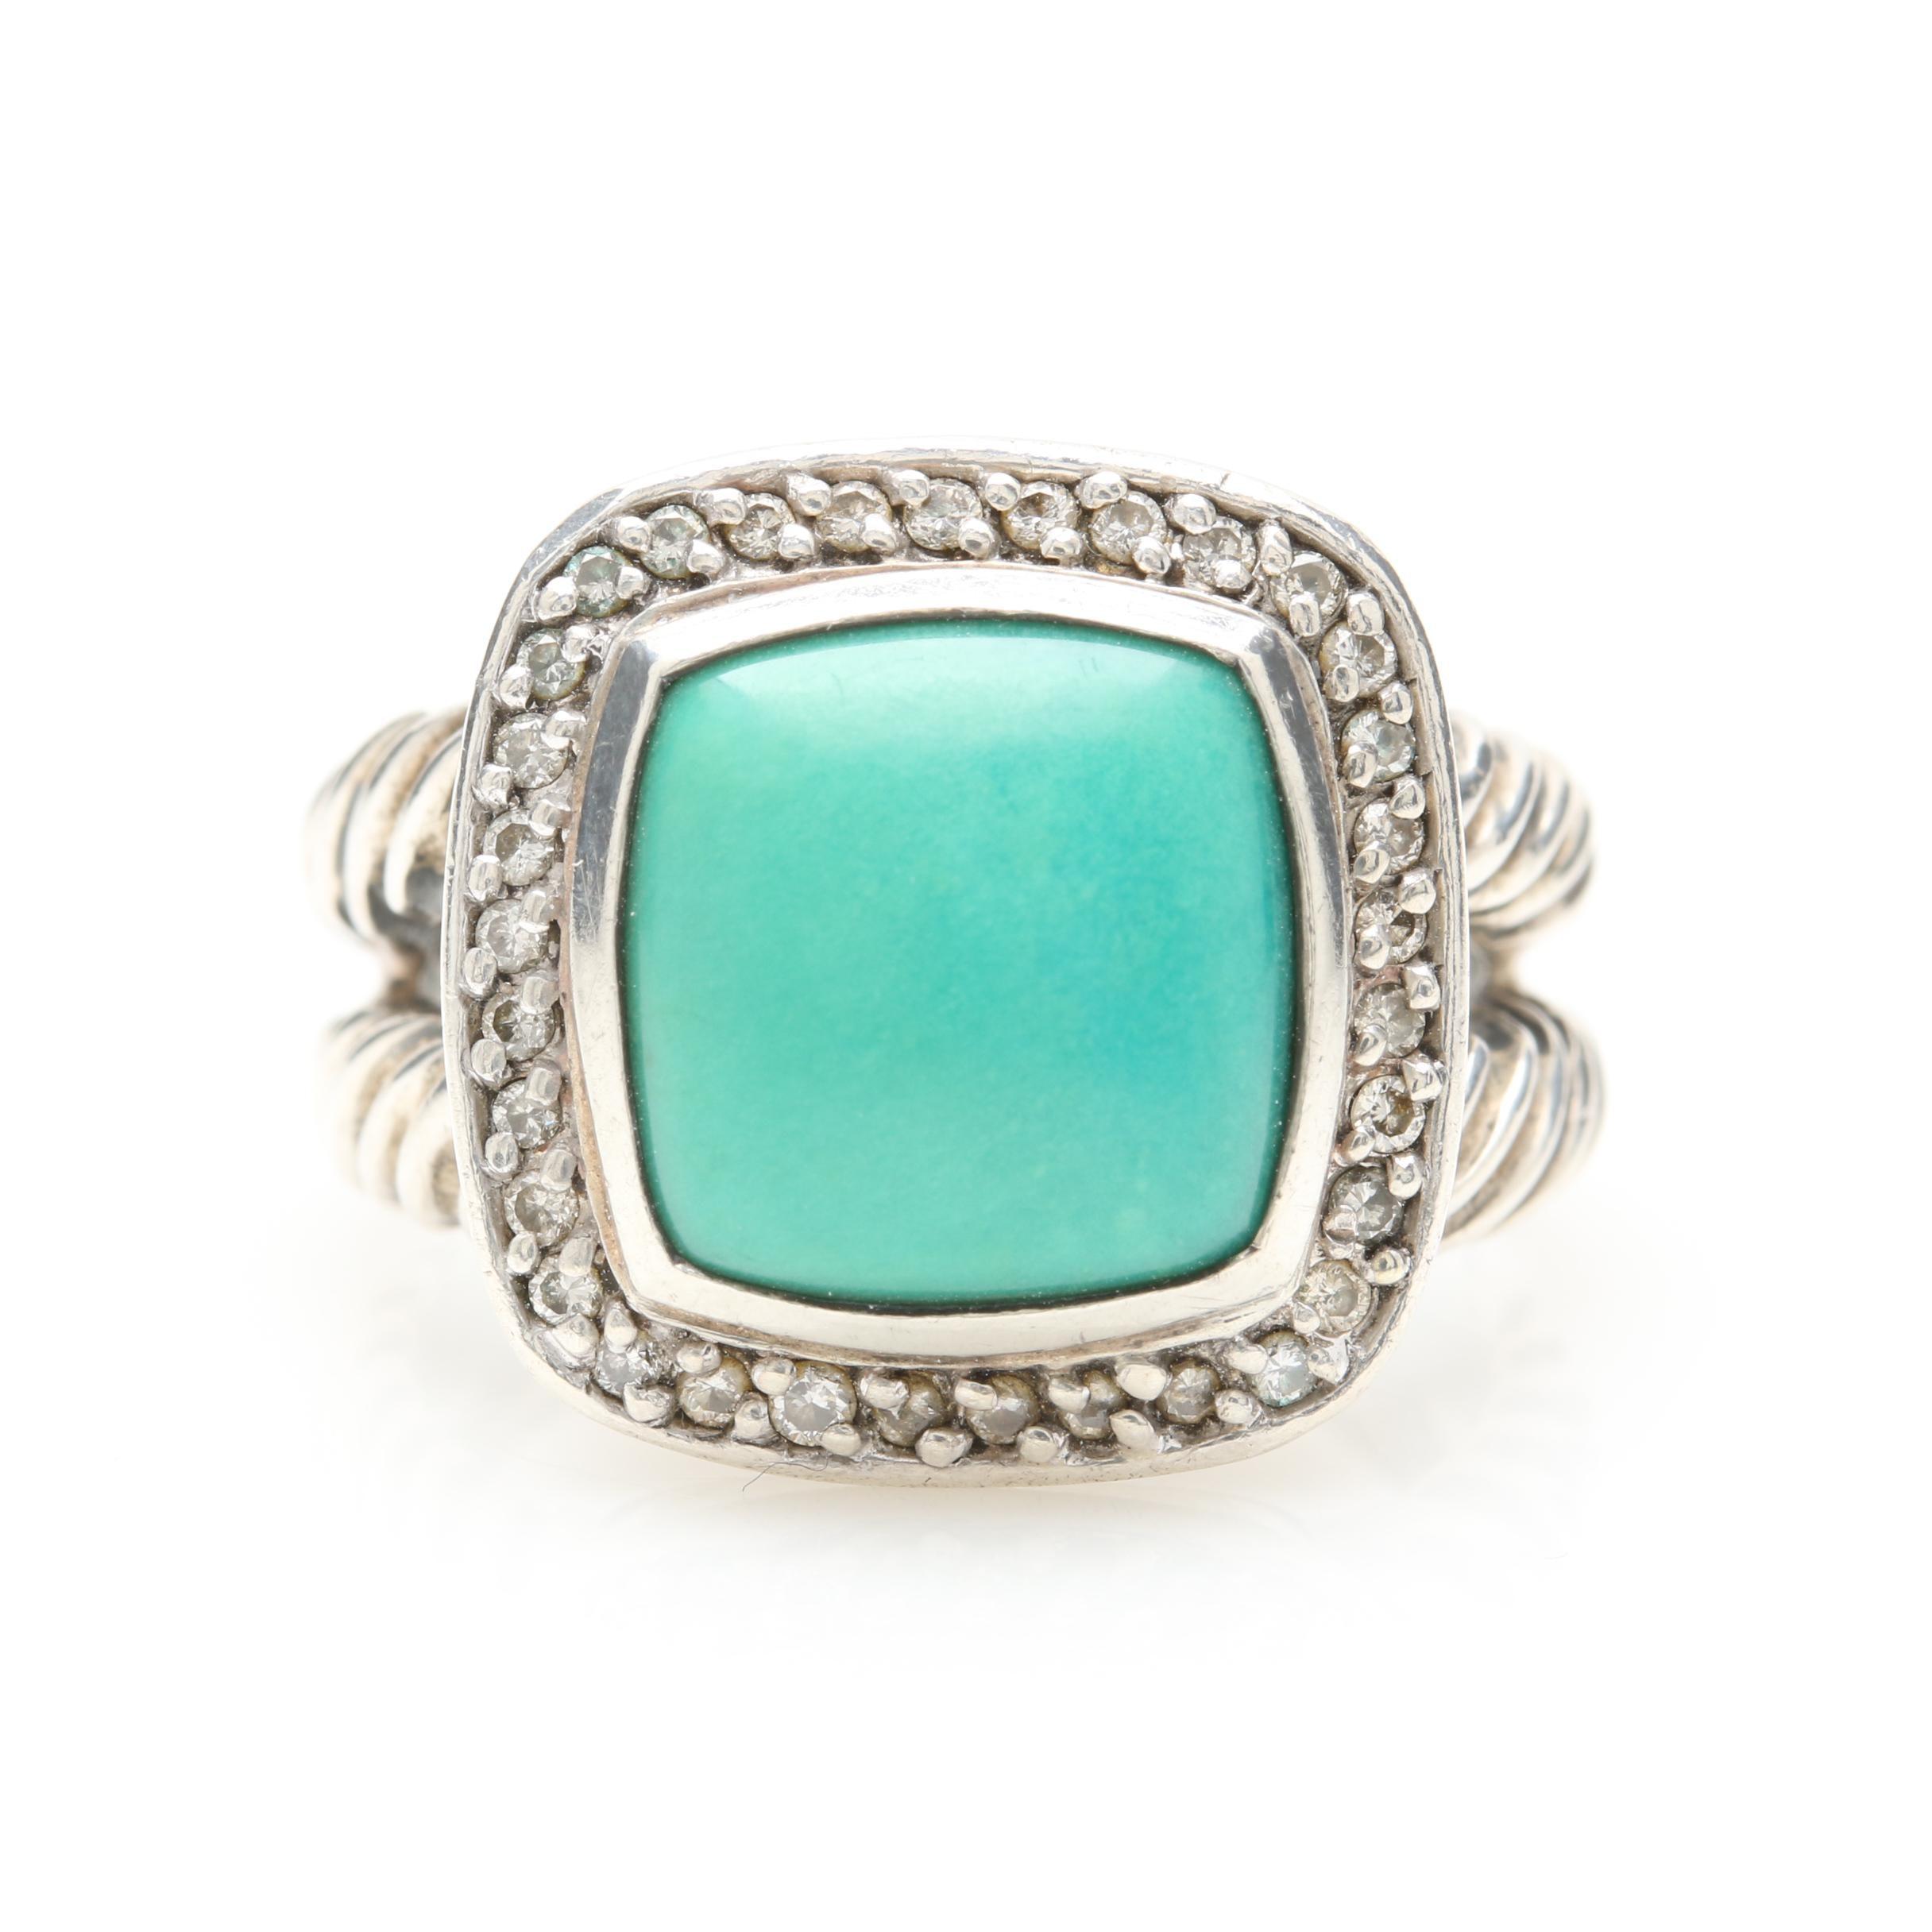 David Yurman Petite Albion Sterling Silver Turquoise and Diamond Ring